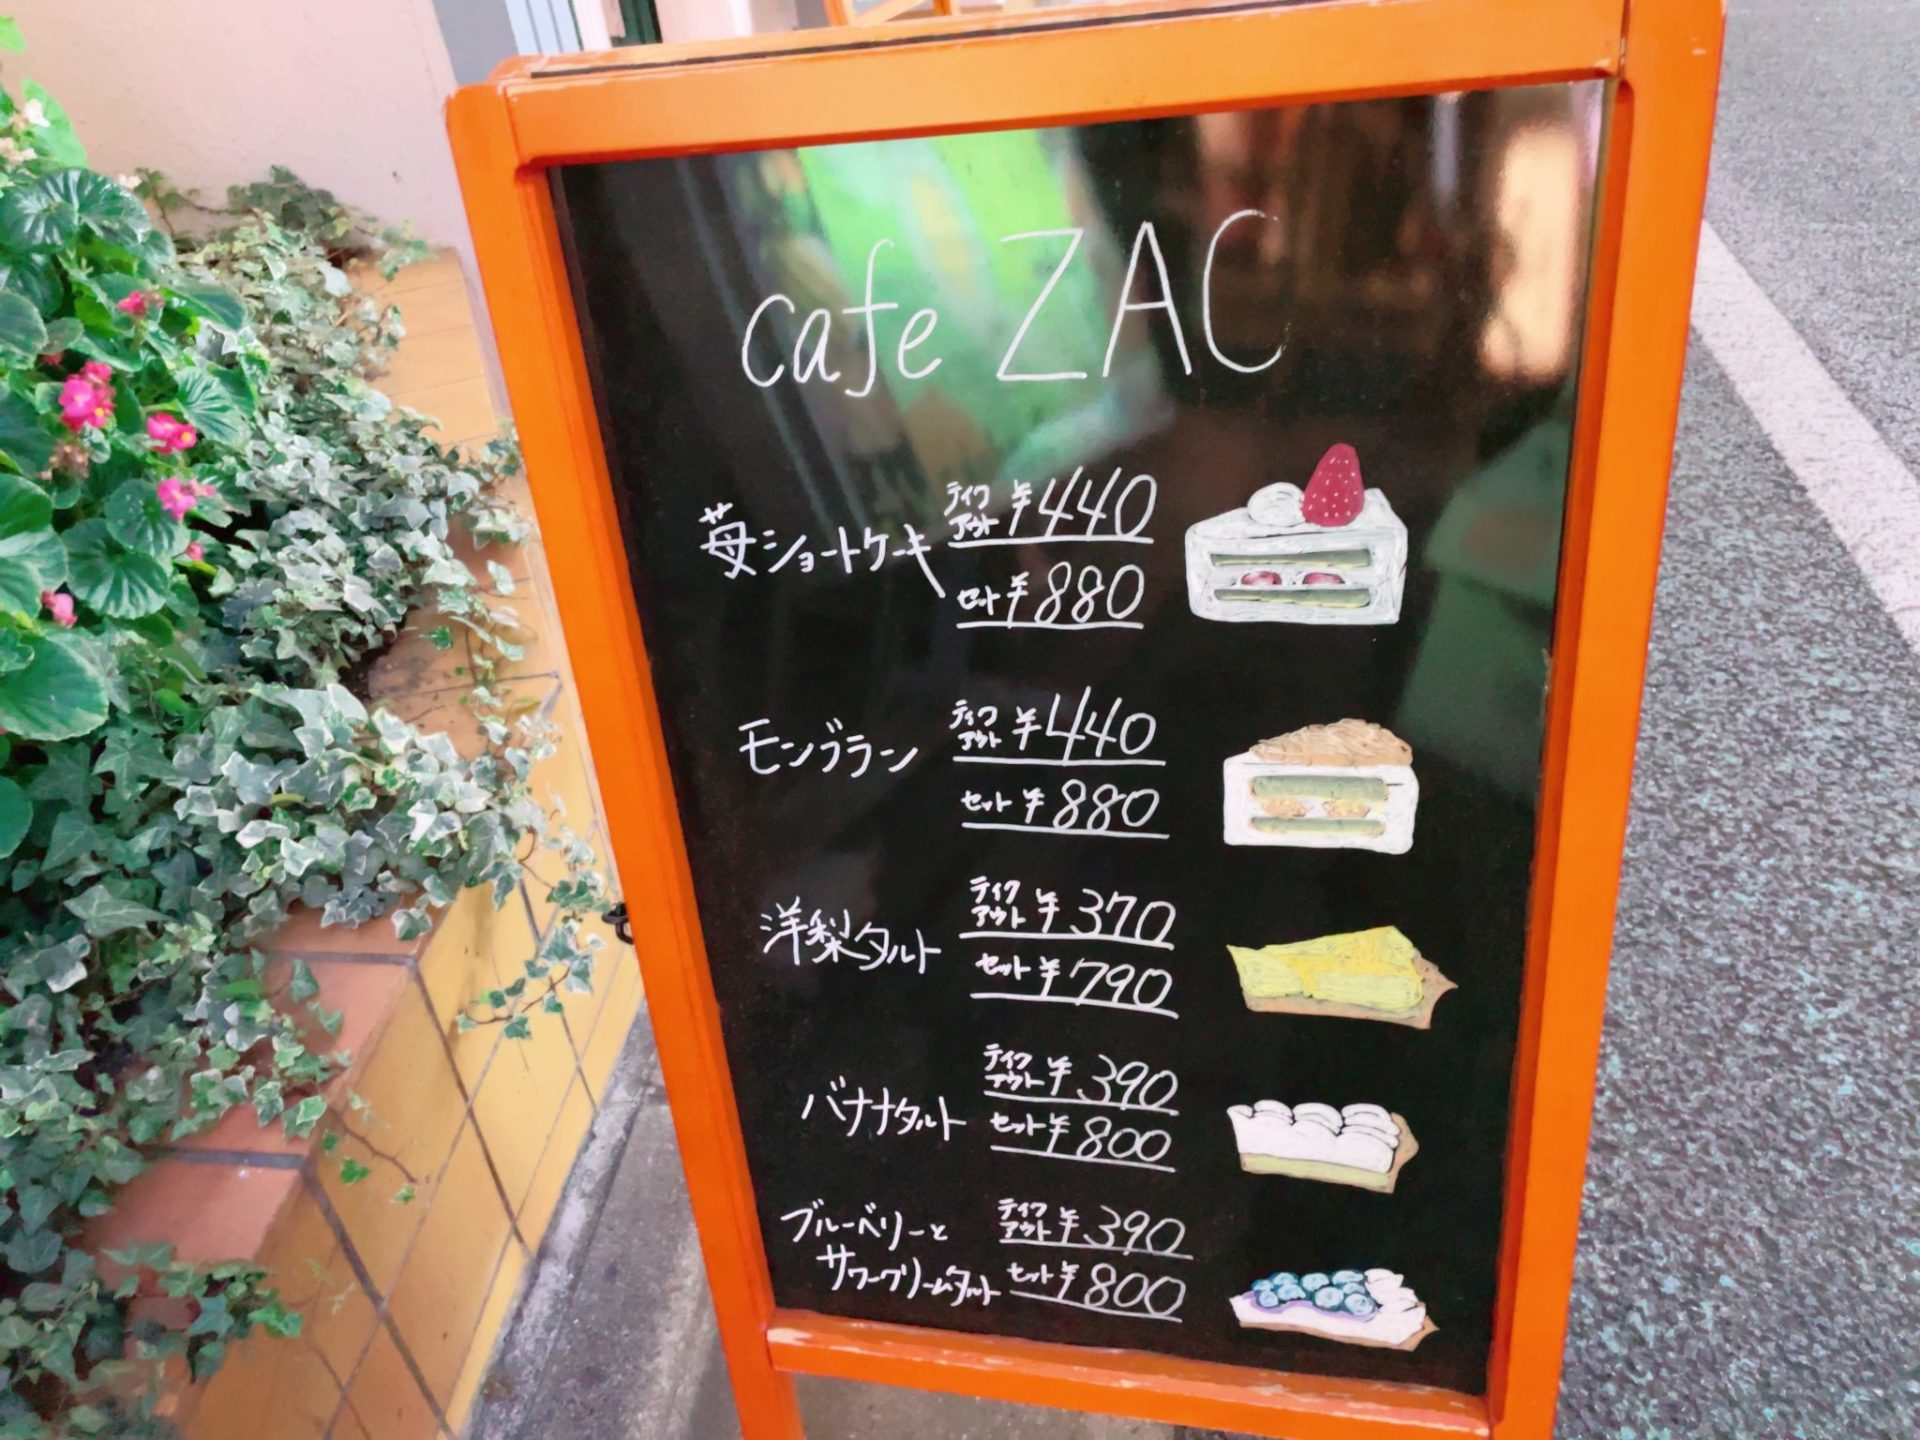 ZAC(ザック)のメニュー